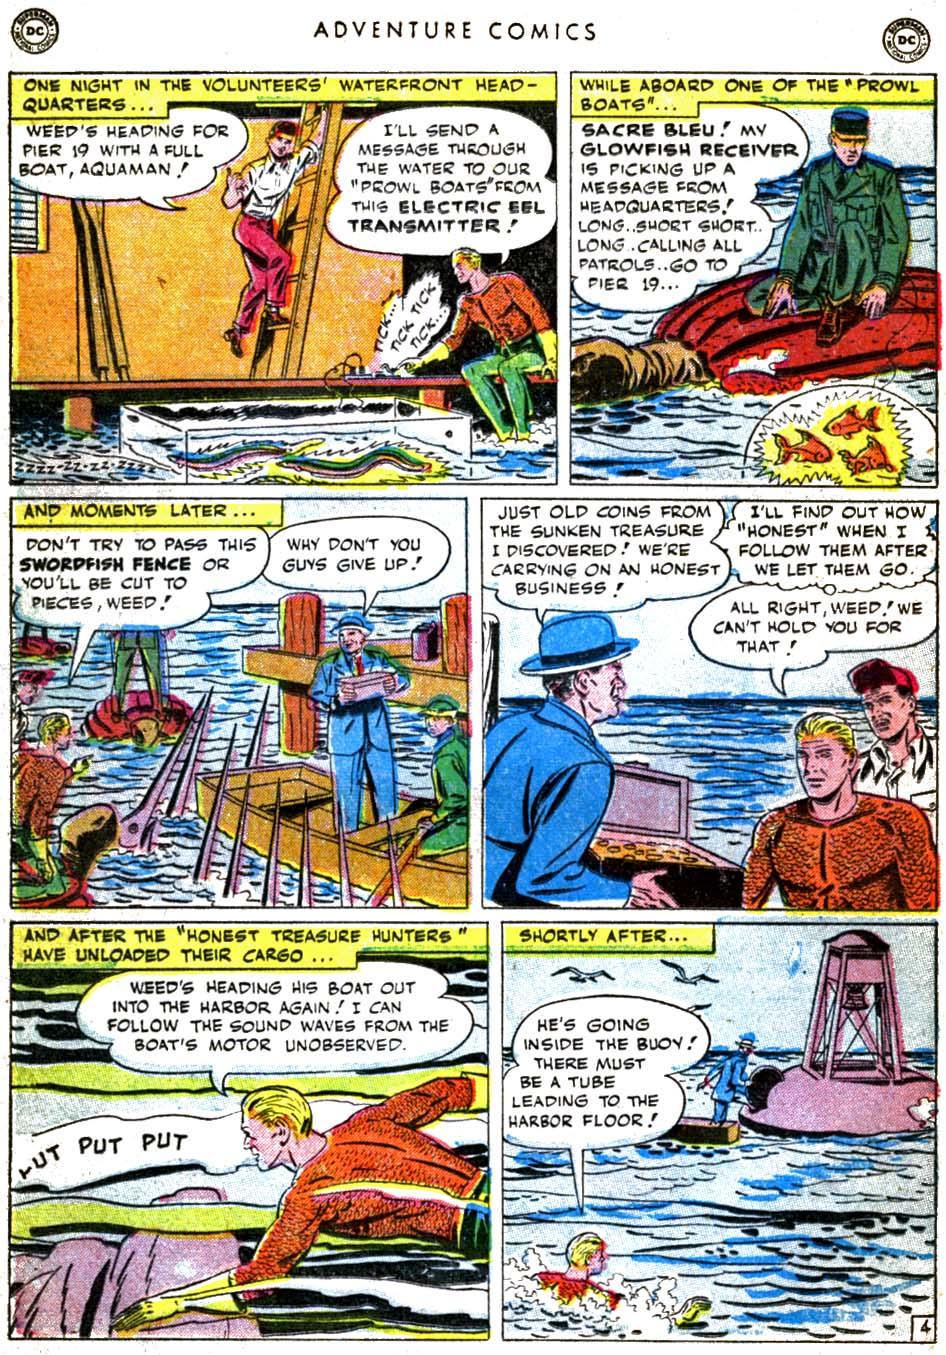 Read online Adventure Comics (1938) comic -  Issue #160 - 20